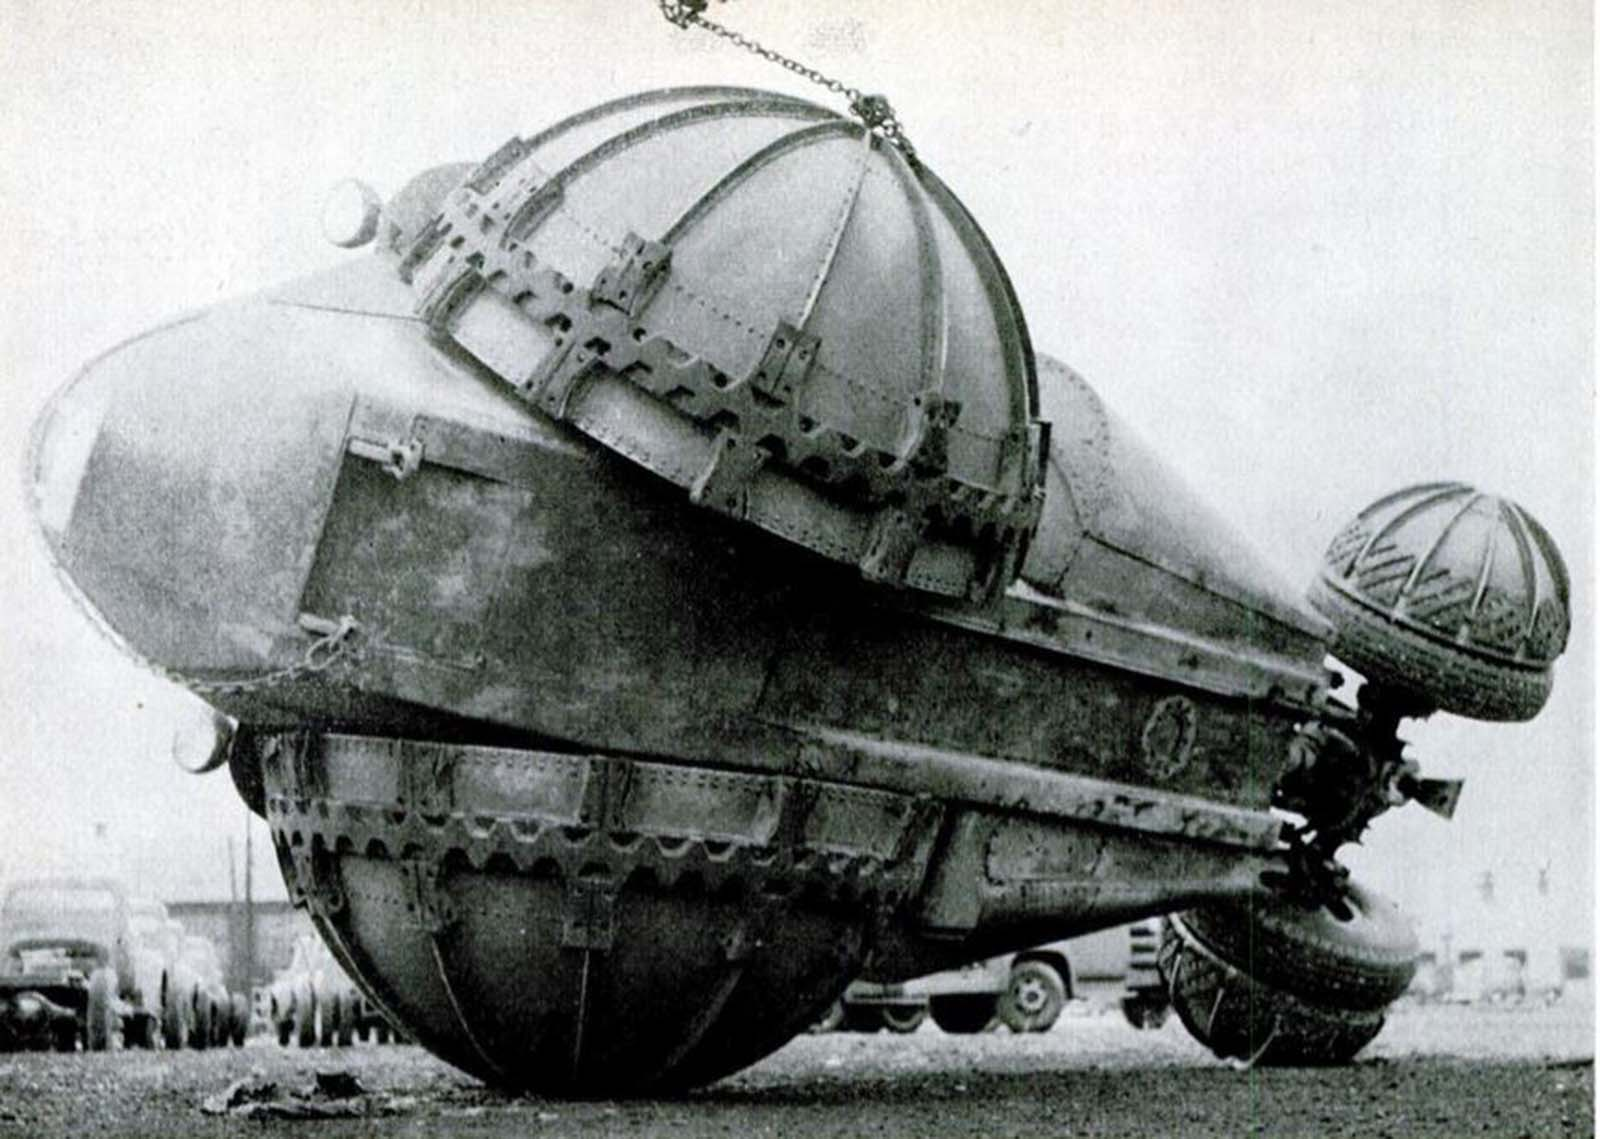 The Rhino: a bizarre experimental all-terrain vehicle, 1954